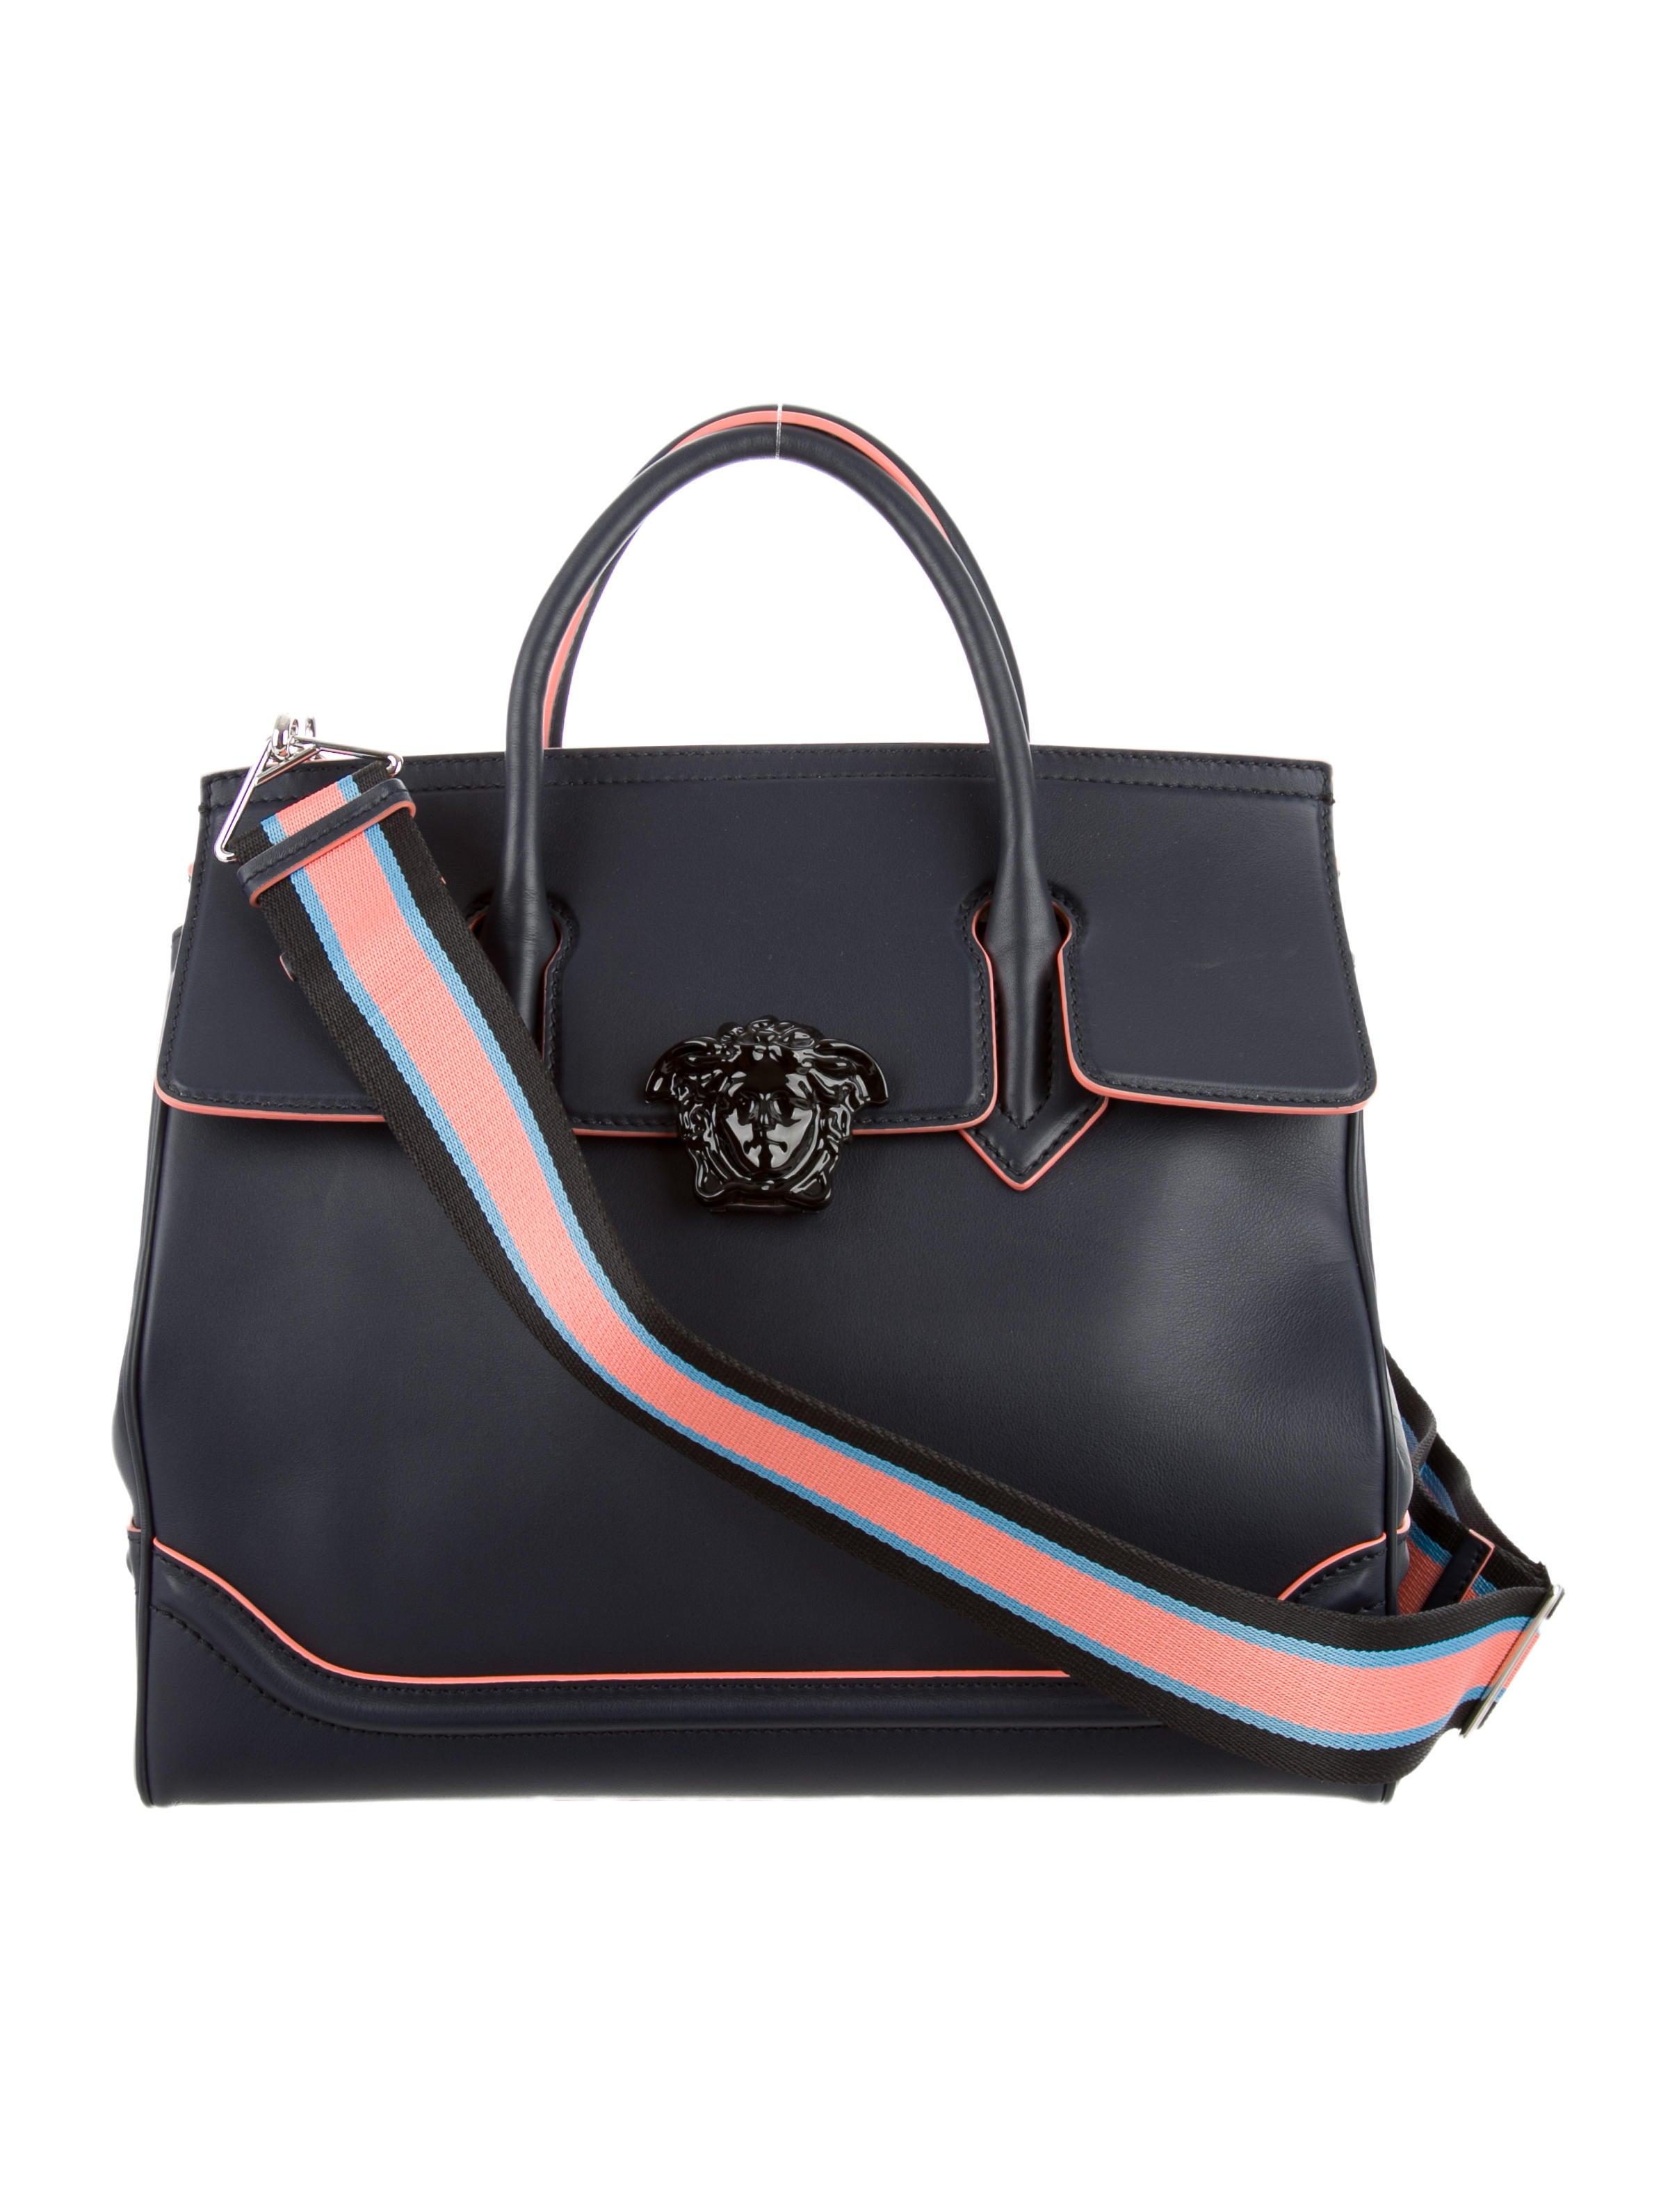 Versace 2016 Medium Palazzo Empire Bag Handbags  : VES265124enlarged from www.therealreal.com size 2412 x 3182 jpeg 389kB